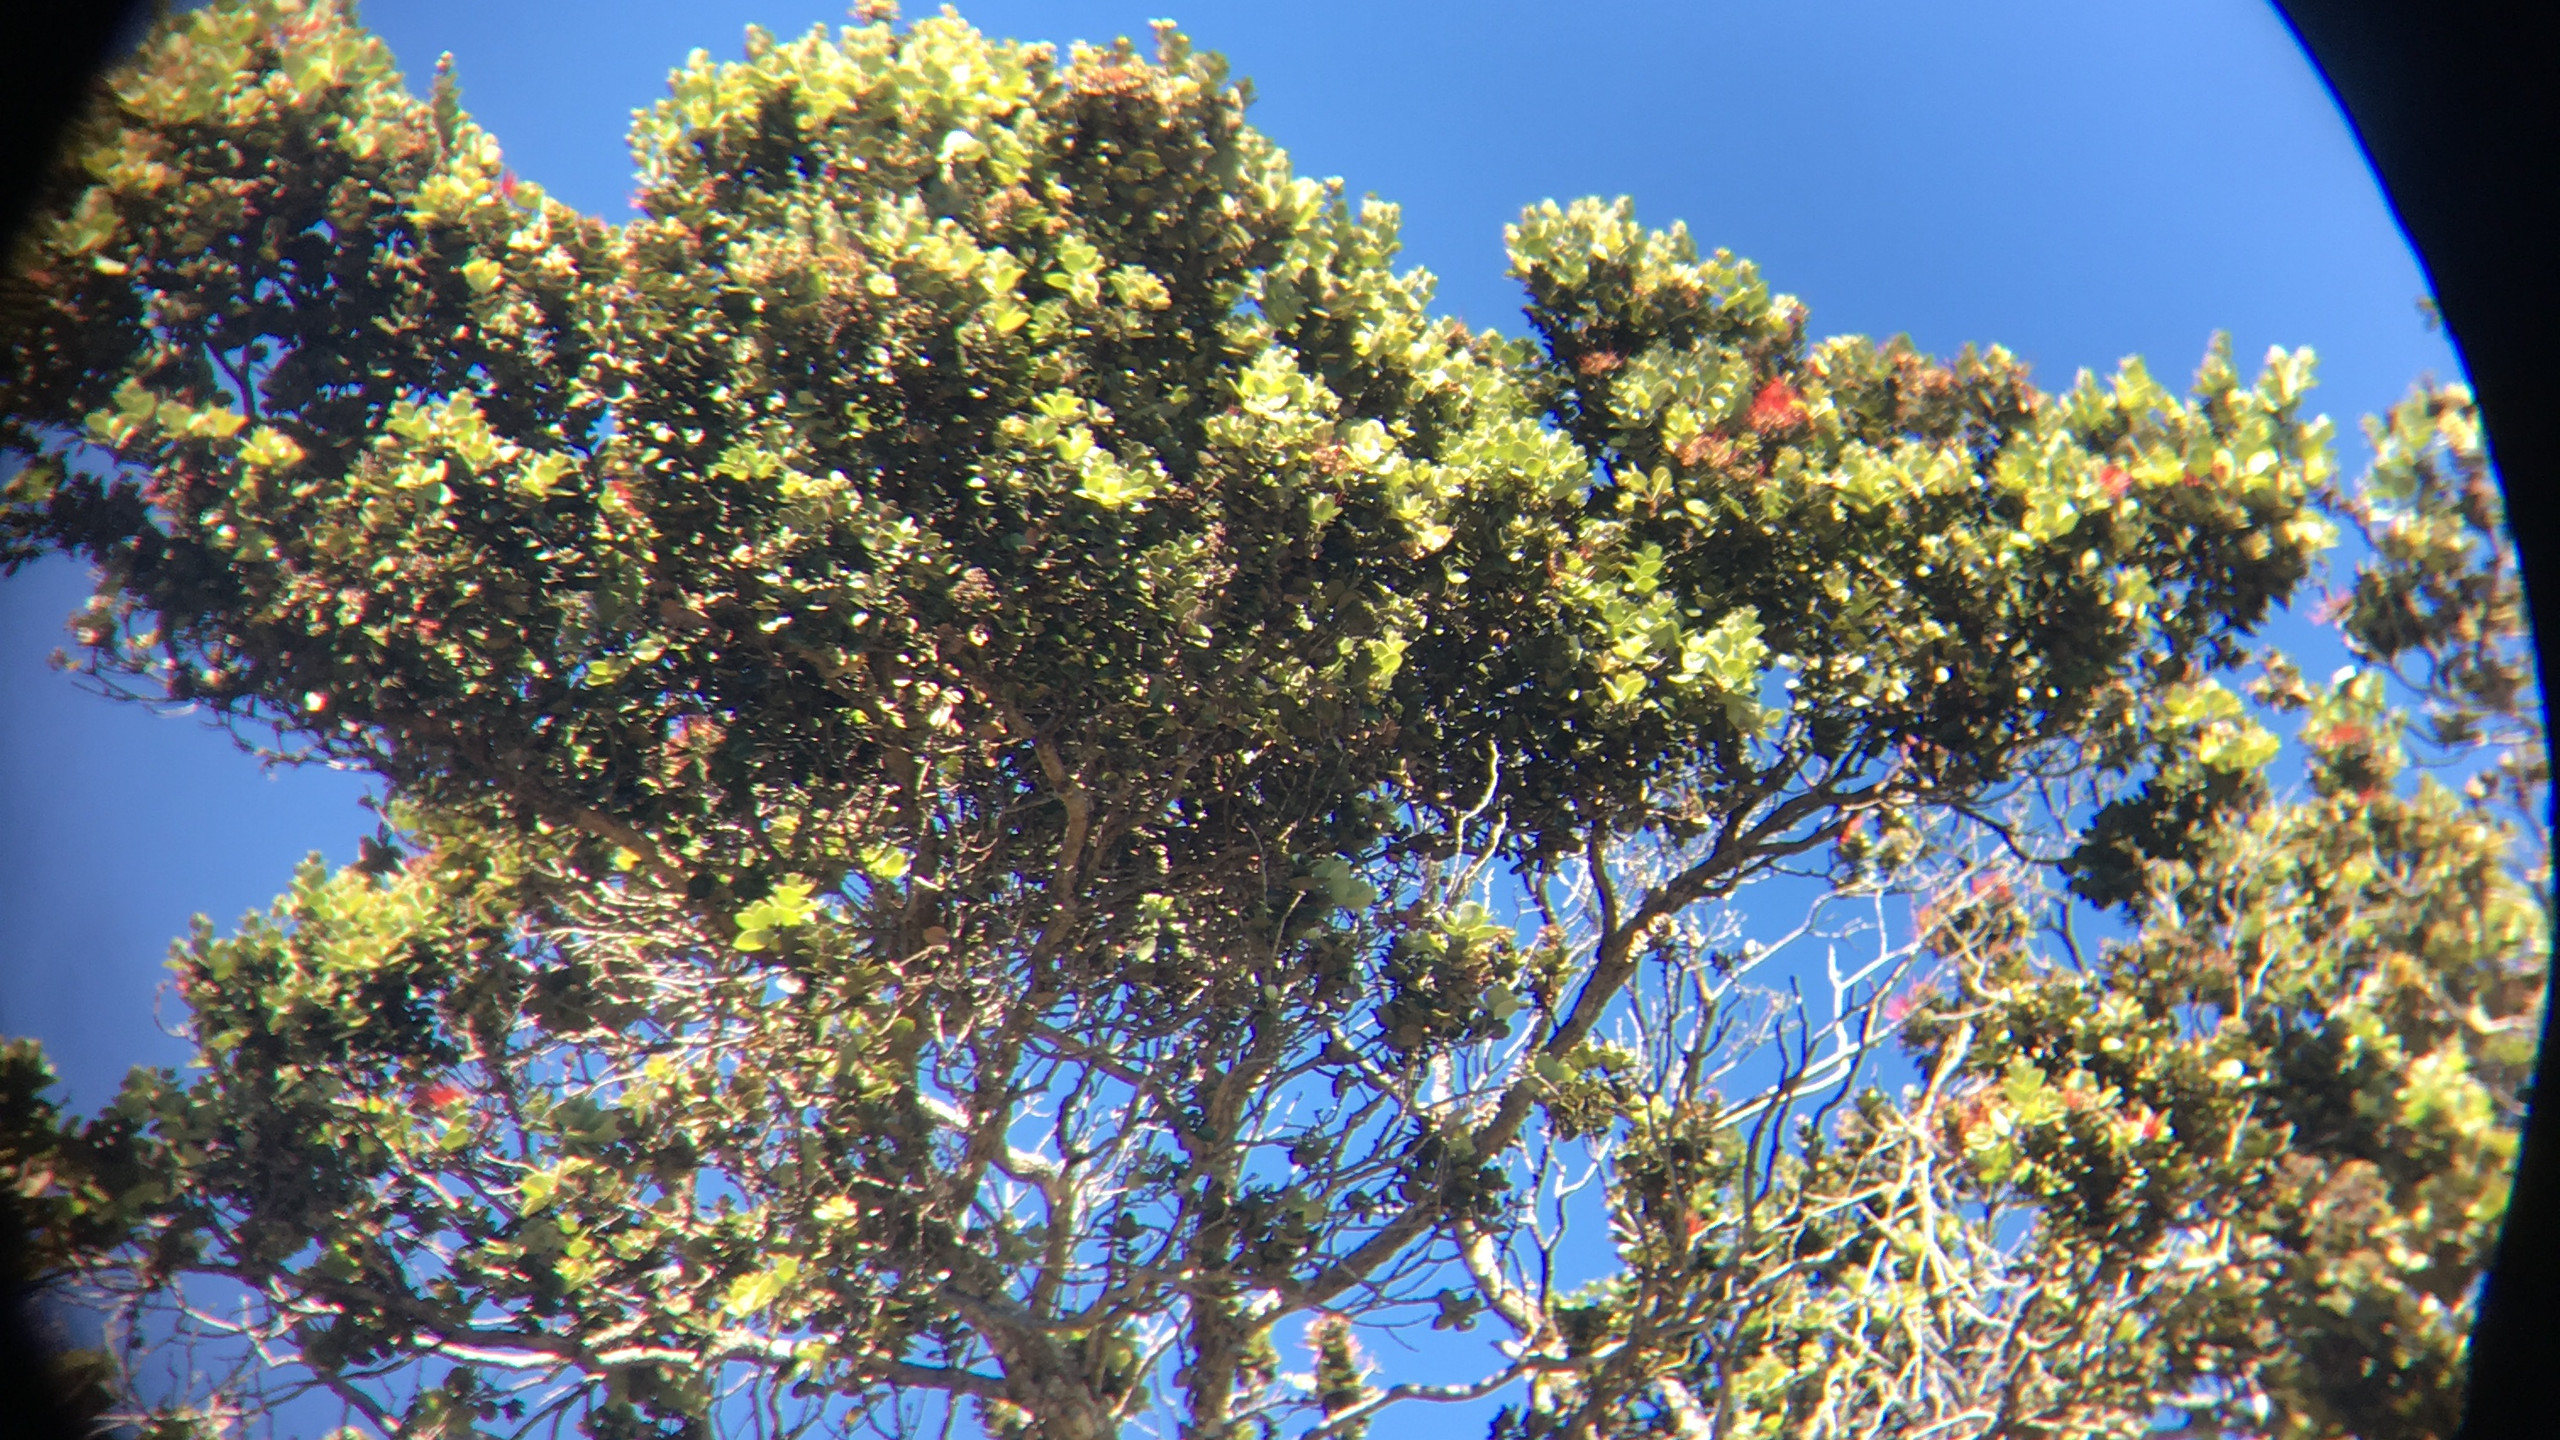 Ohia tree up close